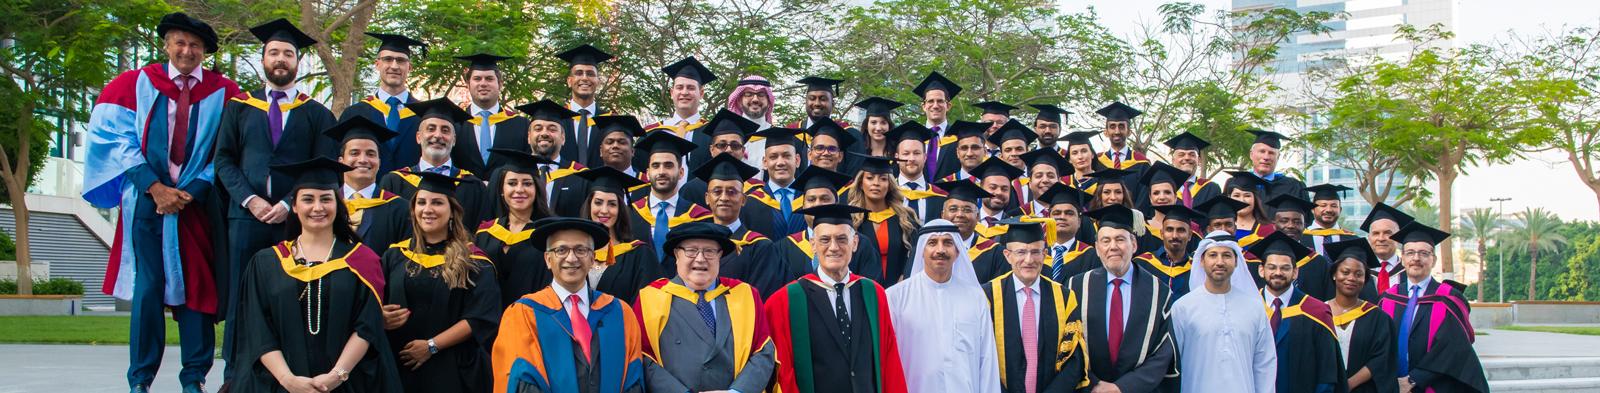 City, University of London's Dubai graduation